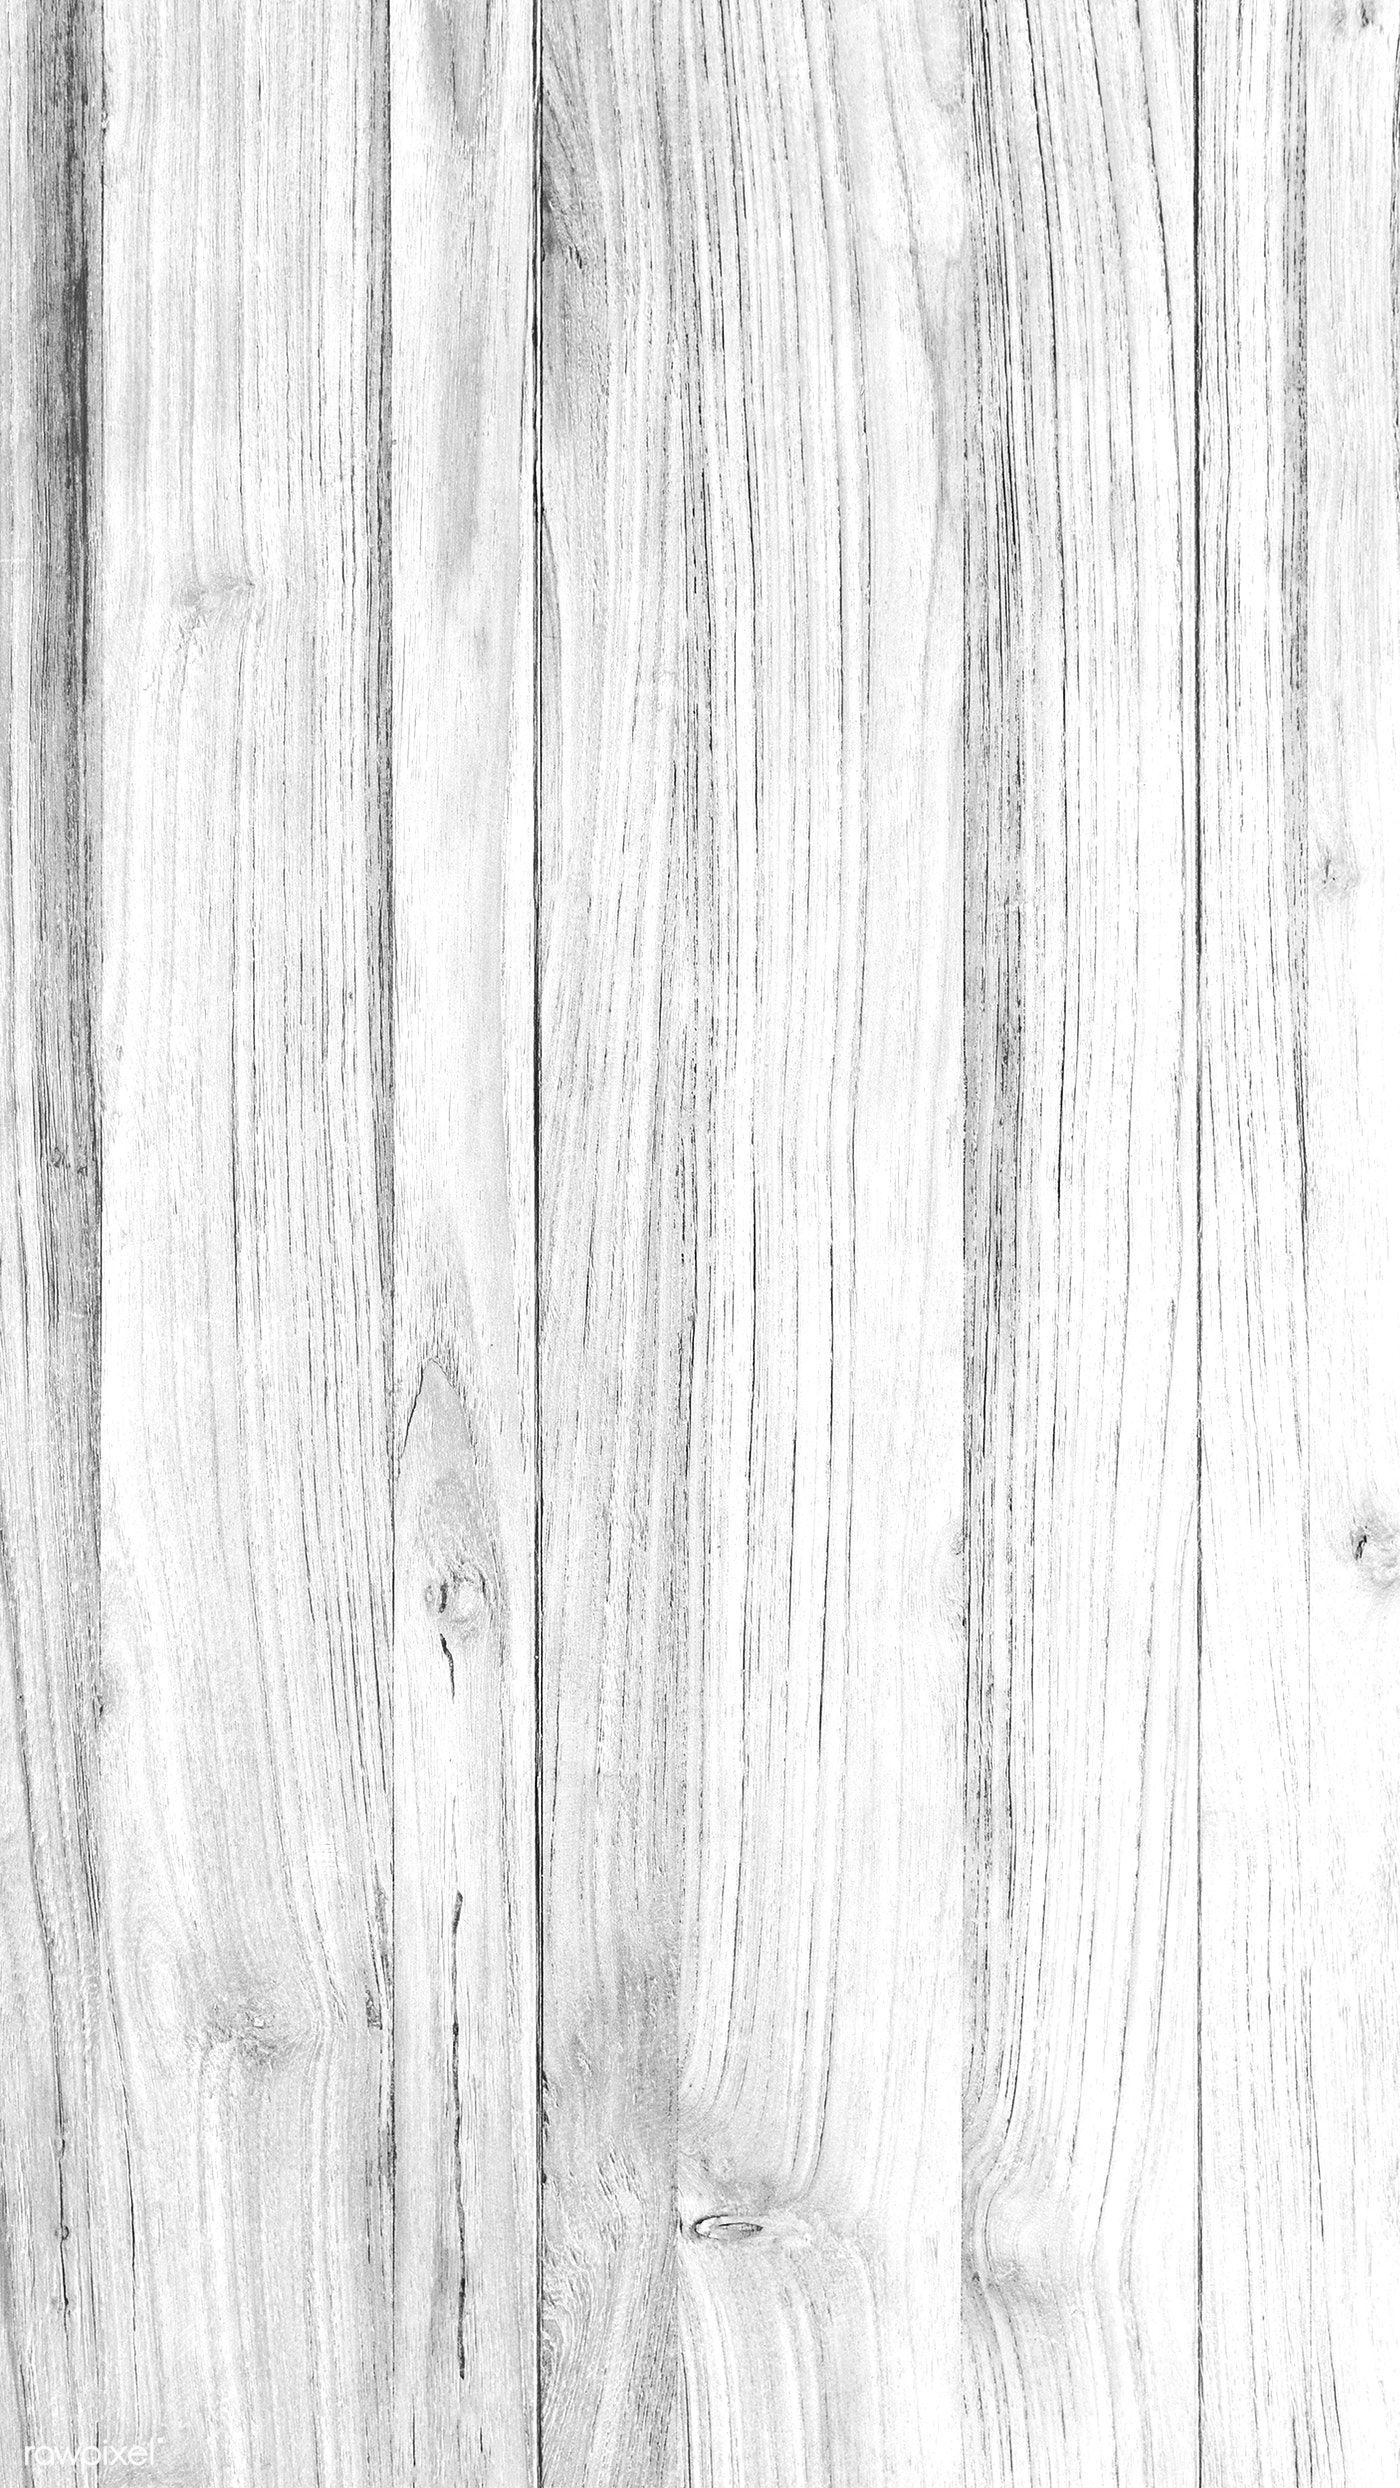 Textured Gray Wood Floor Background Free Image By Rawpixel Com Sasi Grey Wood Floors Grey Wood Texture White Wood Wallpaper